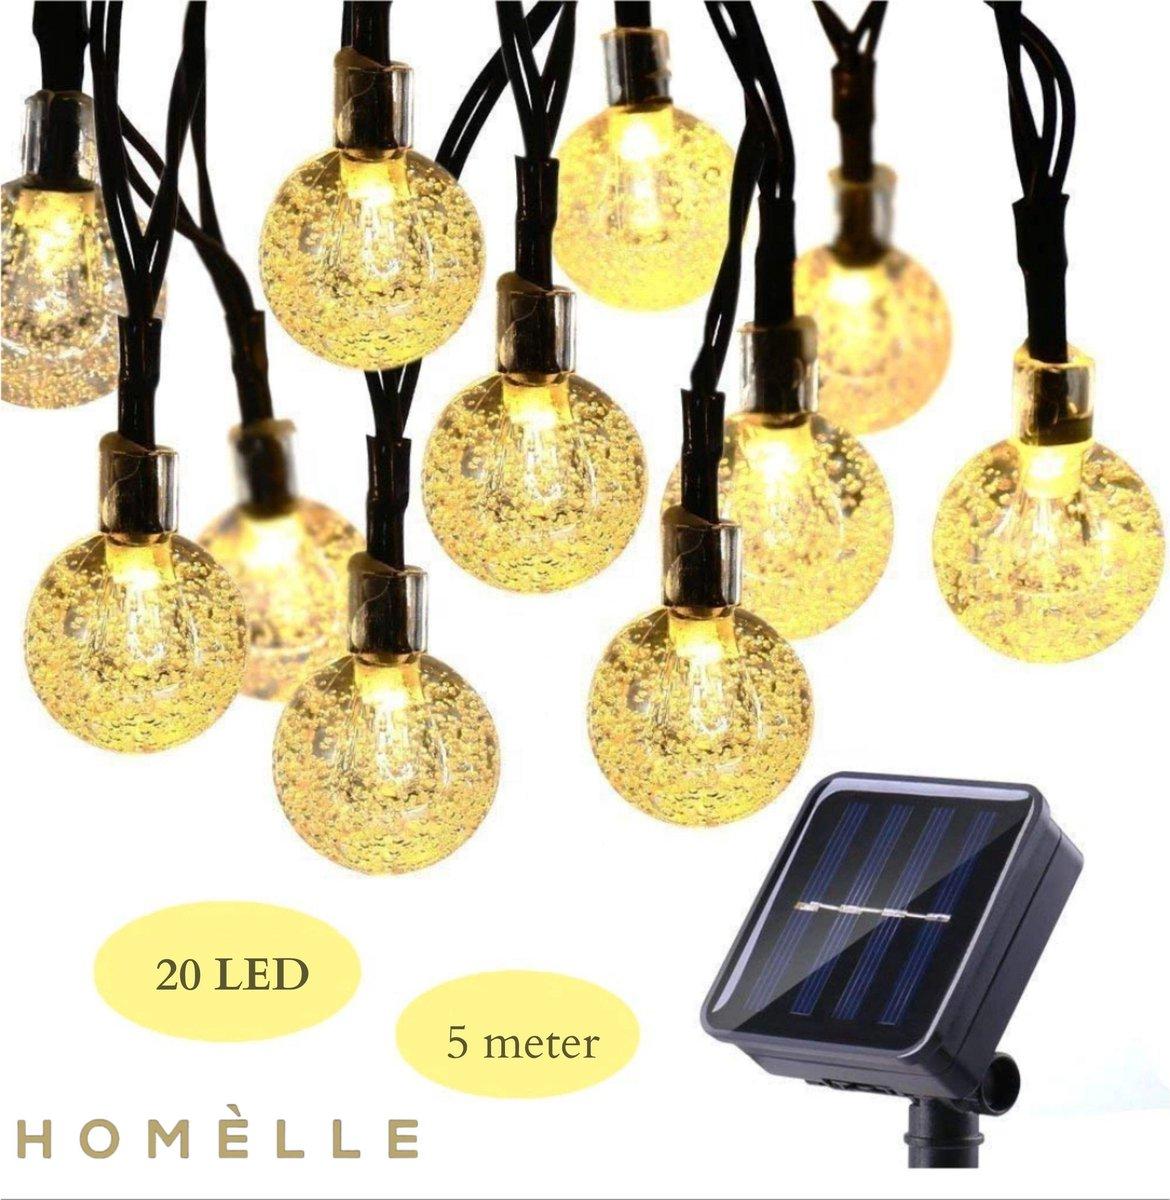 Homèlle Solar lichtsnoer - 20 LED - 5 meter - Warm-wit - ø2cm - Tuinverlichting op zonne-energie - B